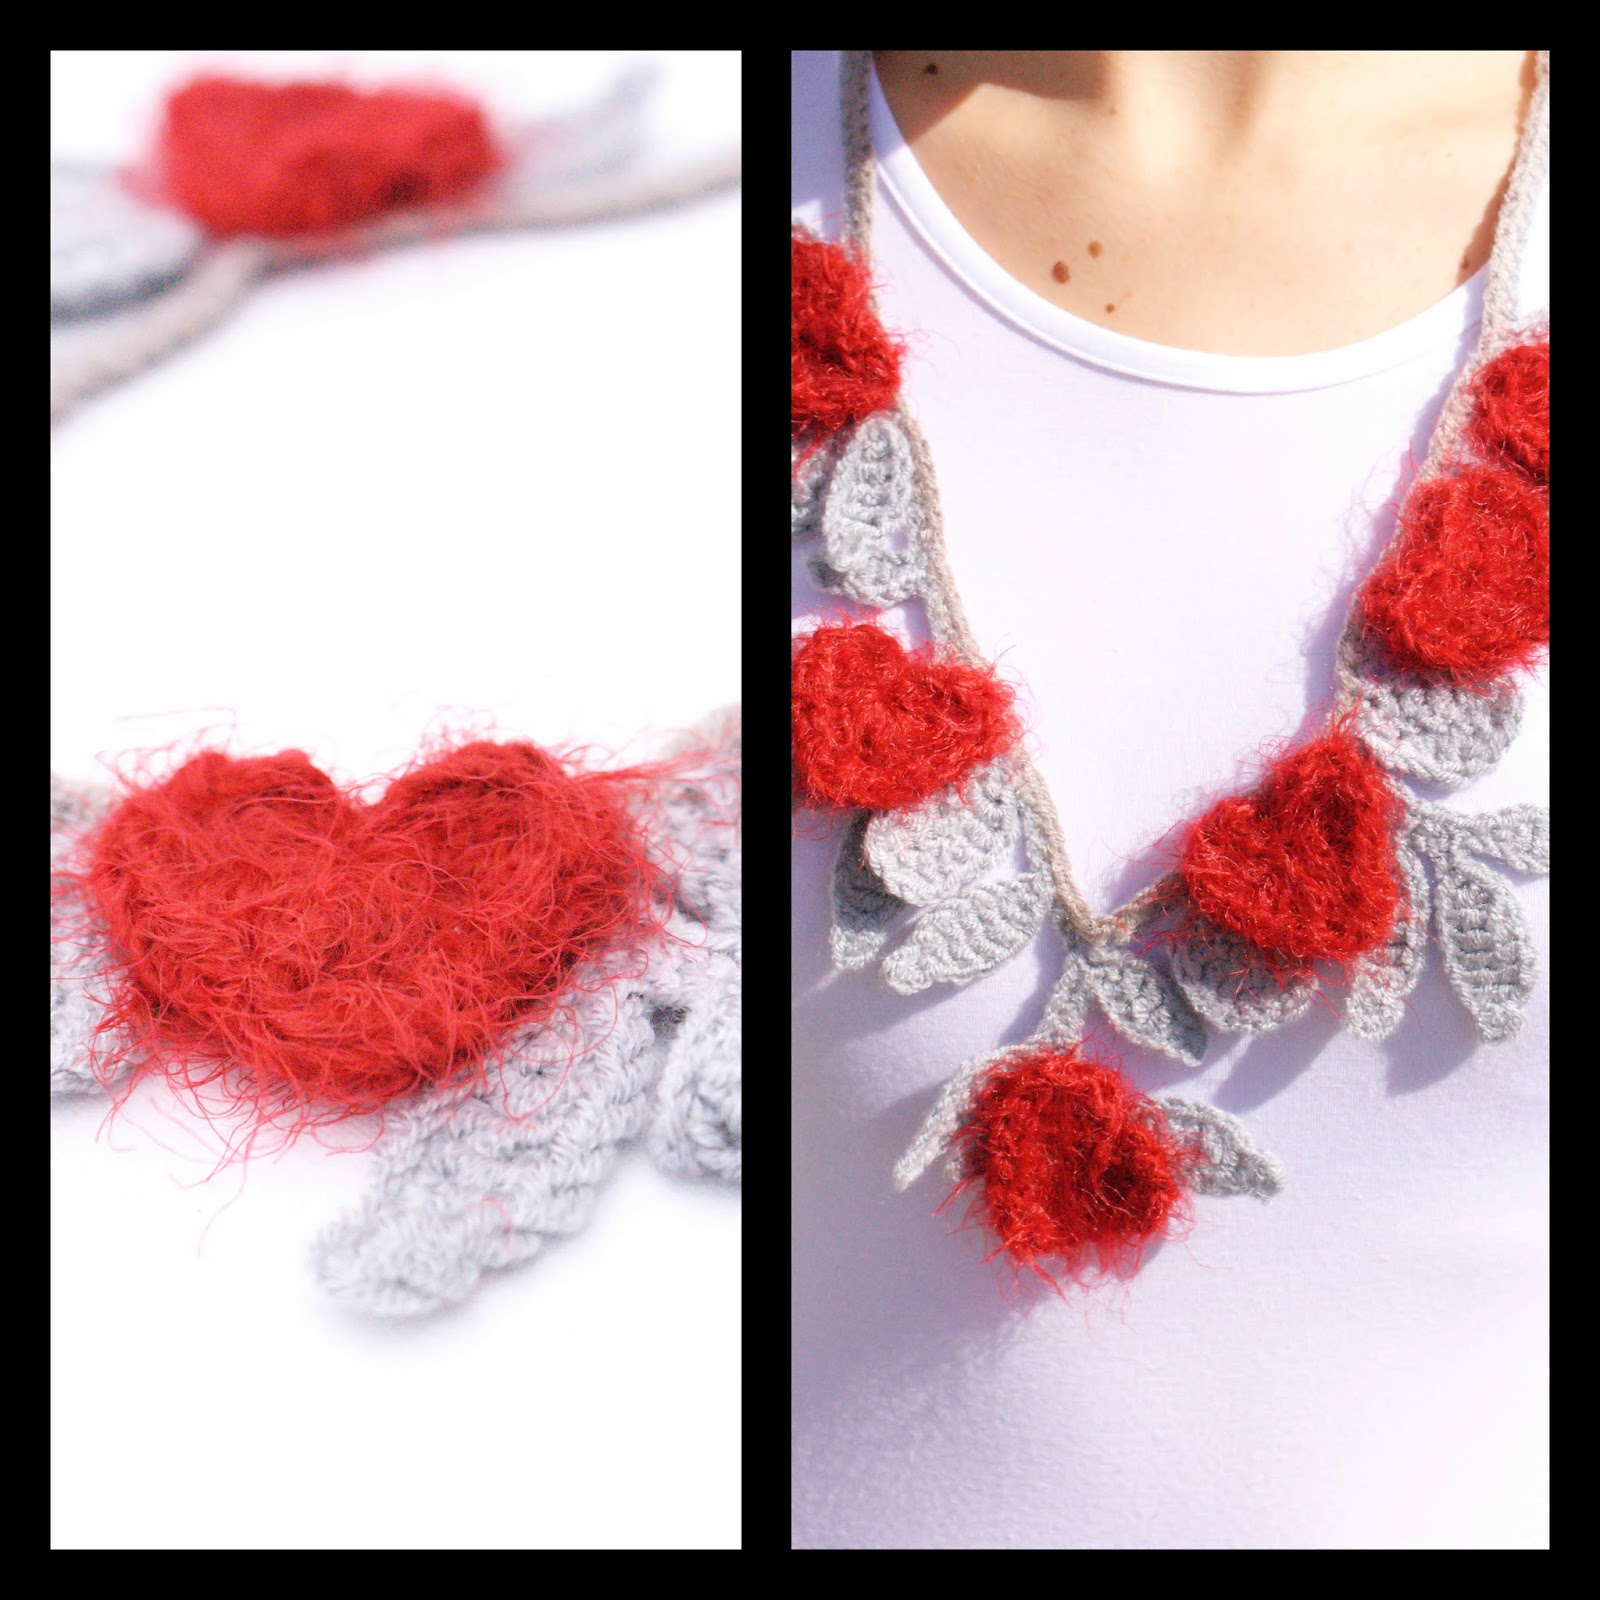 Crocheted necklace with red hearts   Πλεκτό κολιέ με κόκκινες καρδιές c8cb43db51f